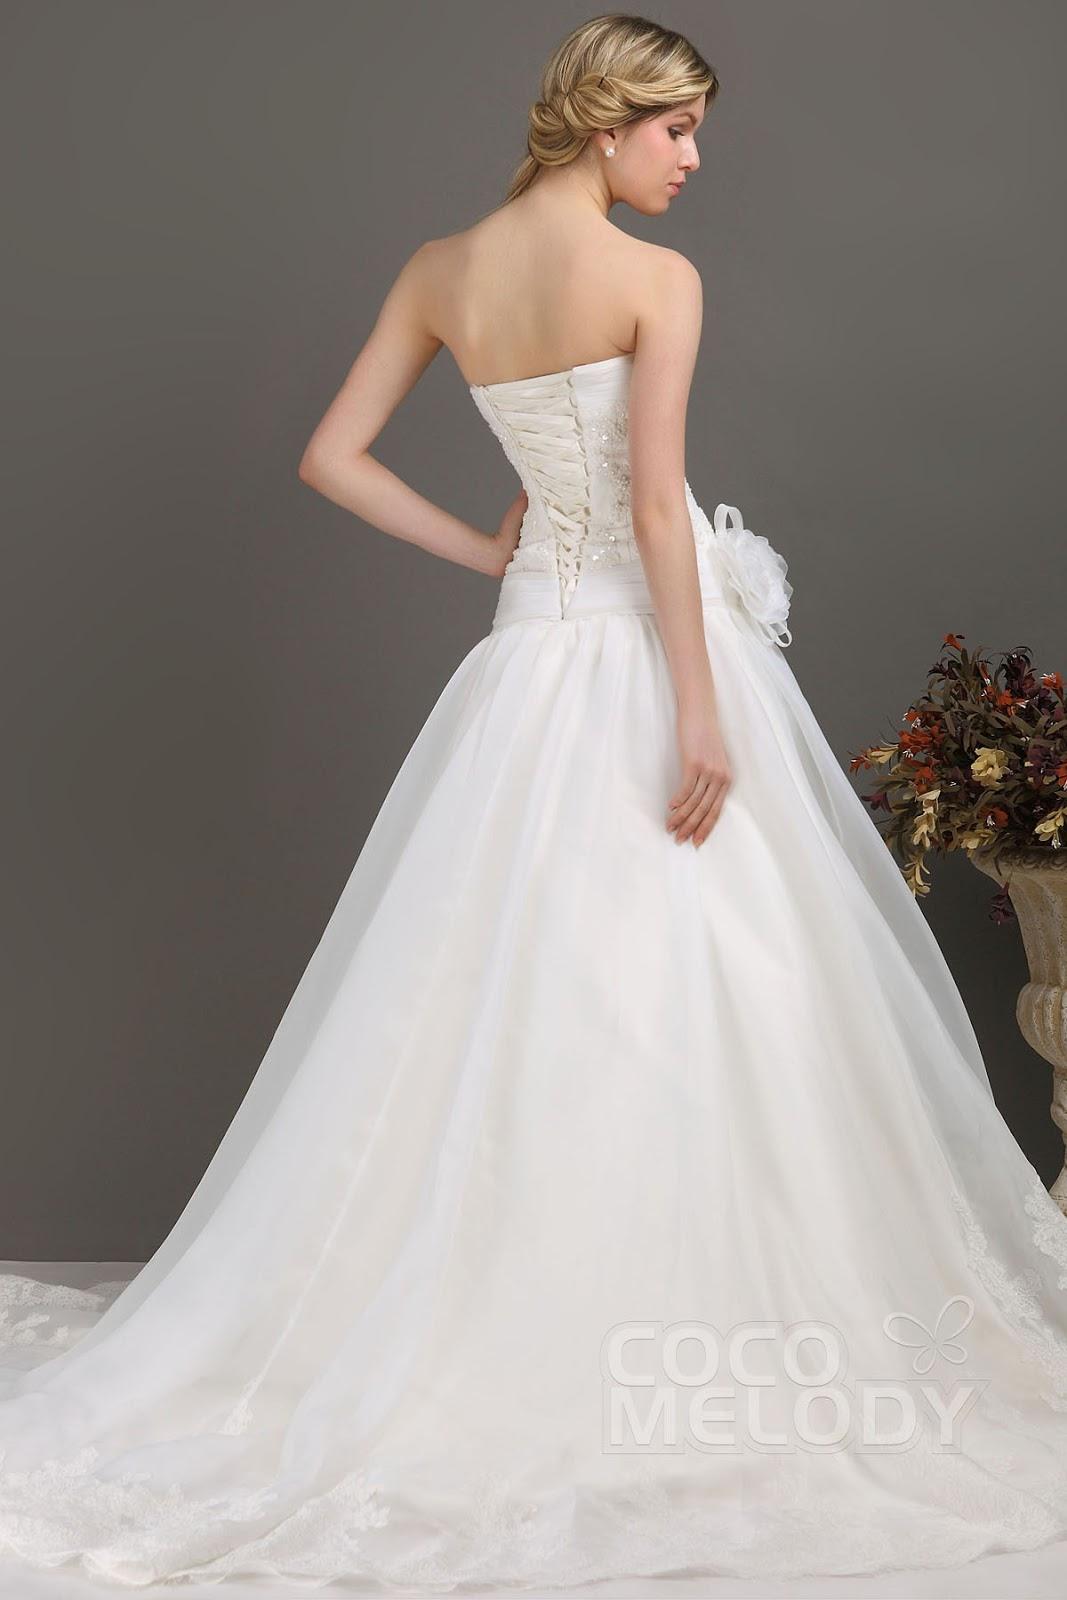 flower girl dresses : Picking wedding dresses for everyone fat ...